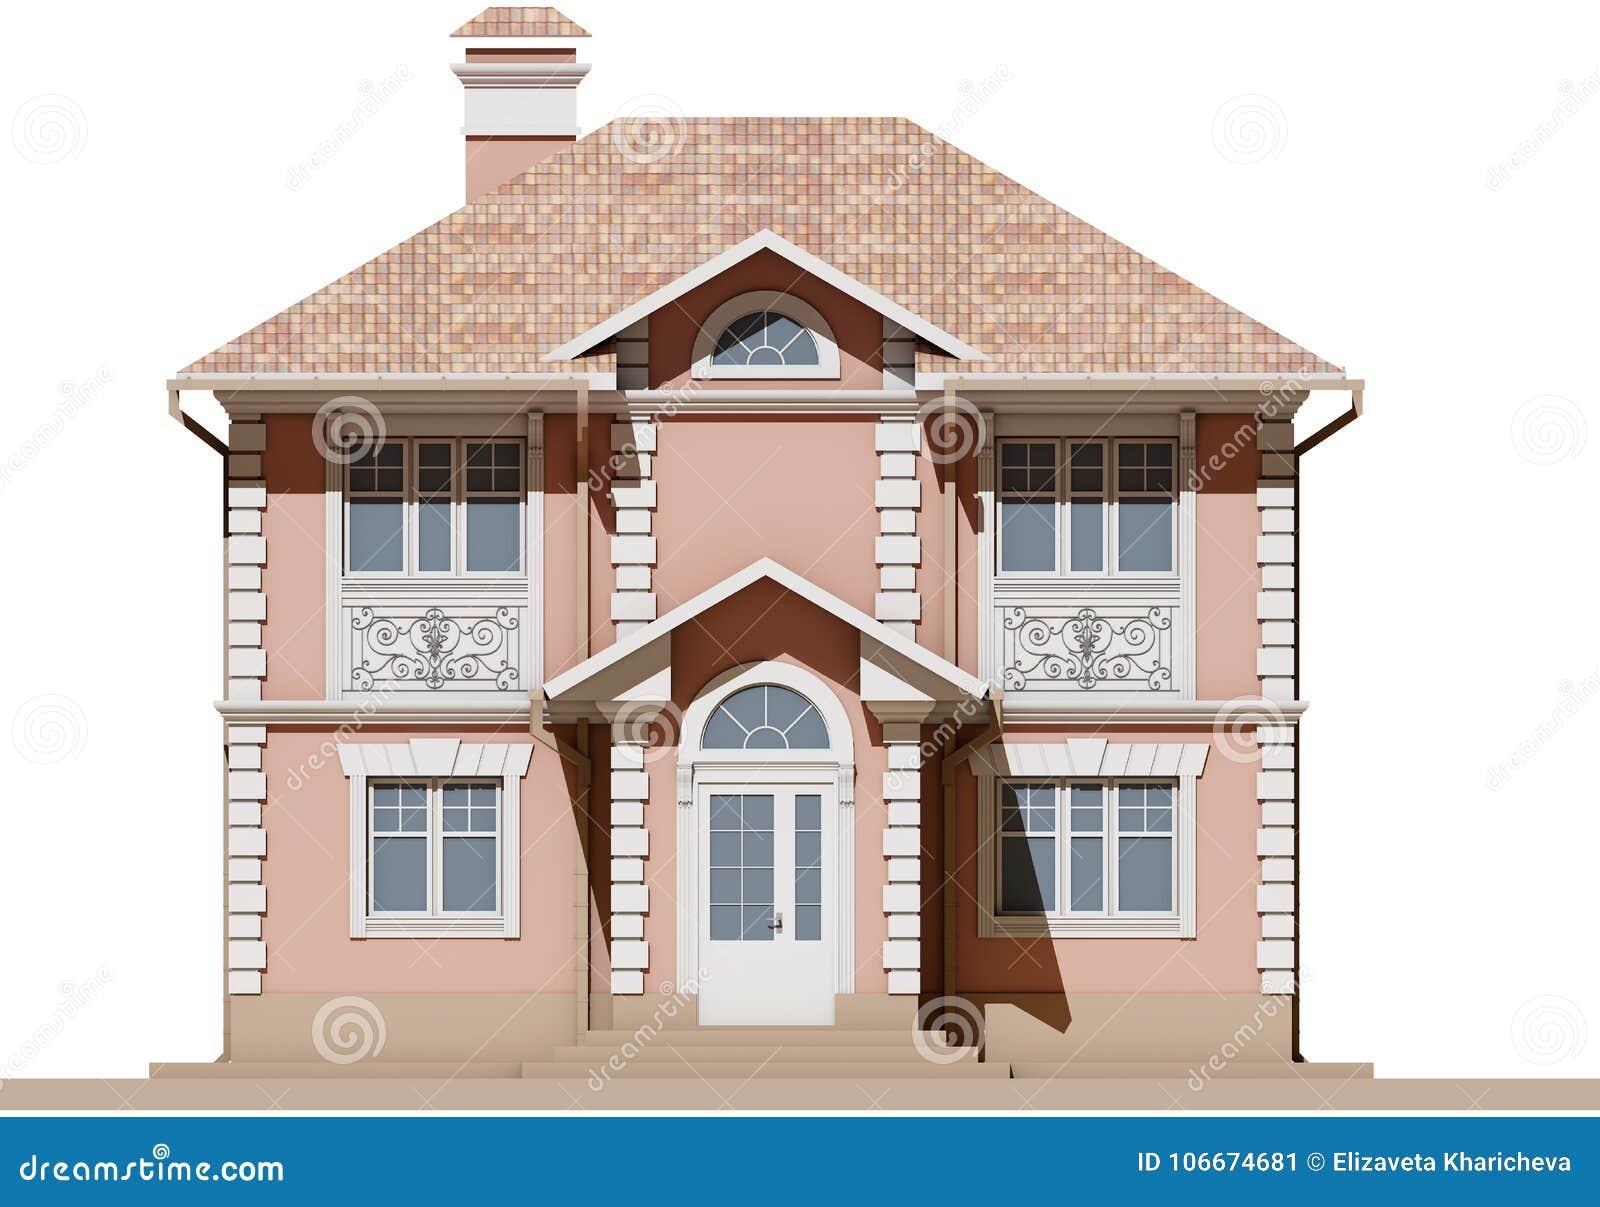 Главный фасад жилого, розового и симметричного дома 3d представляют